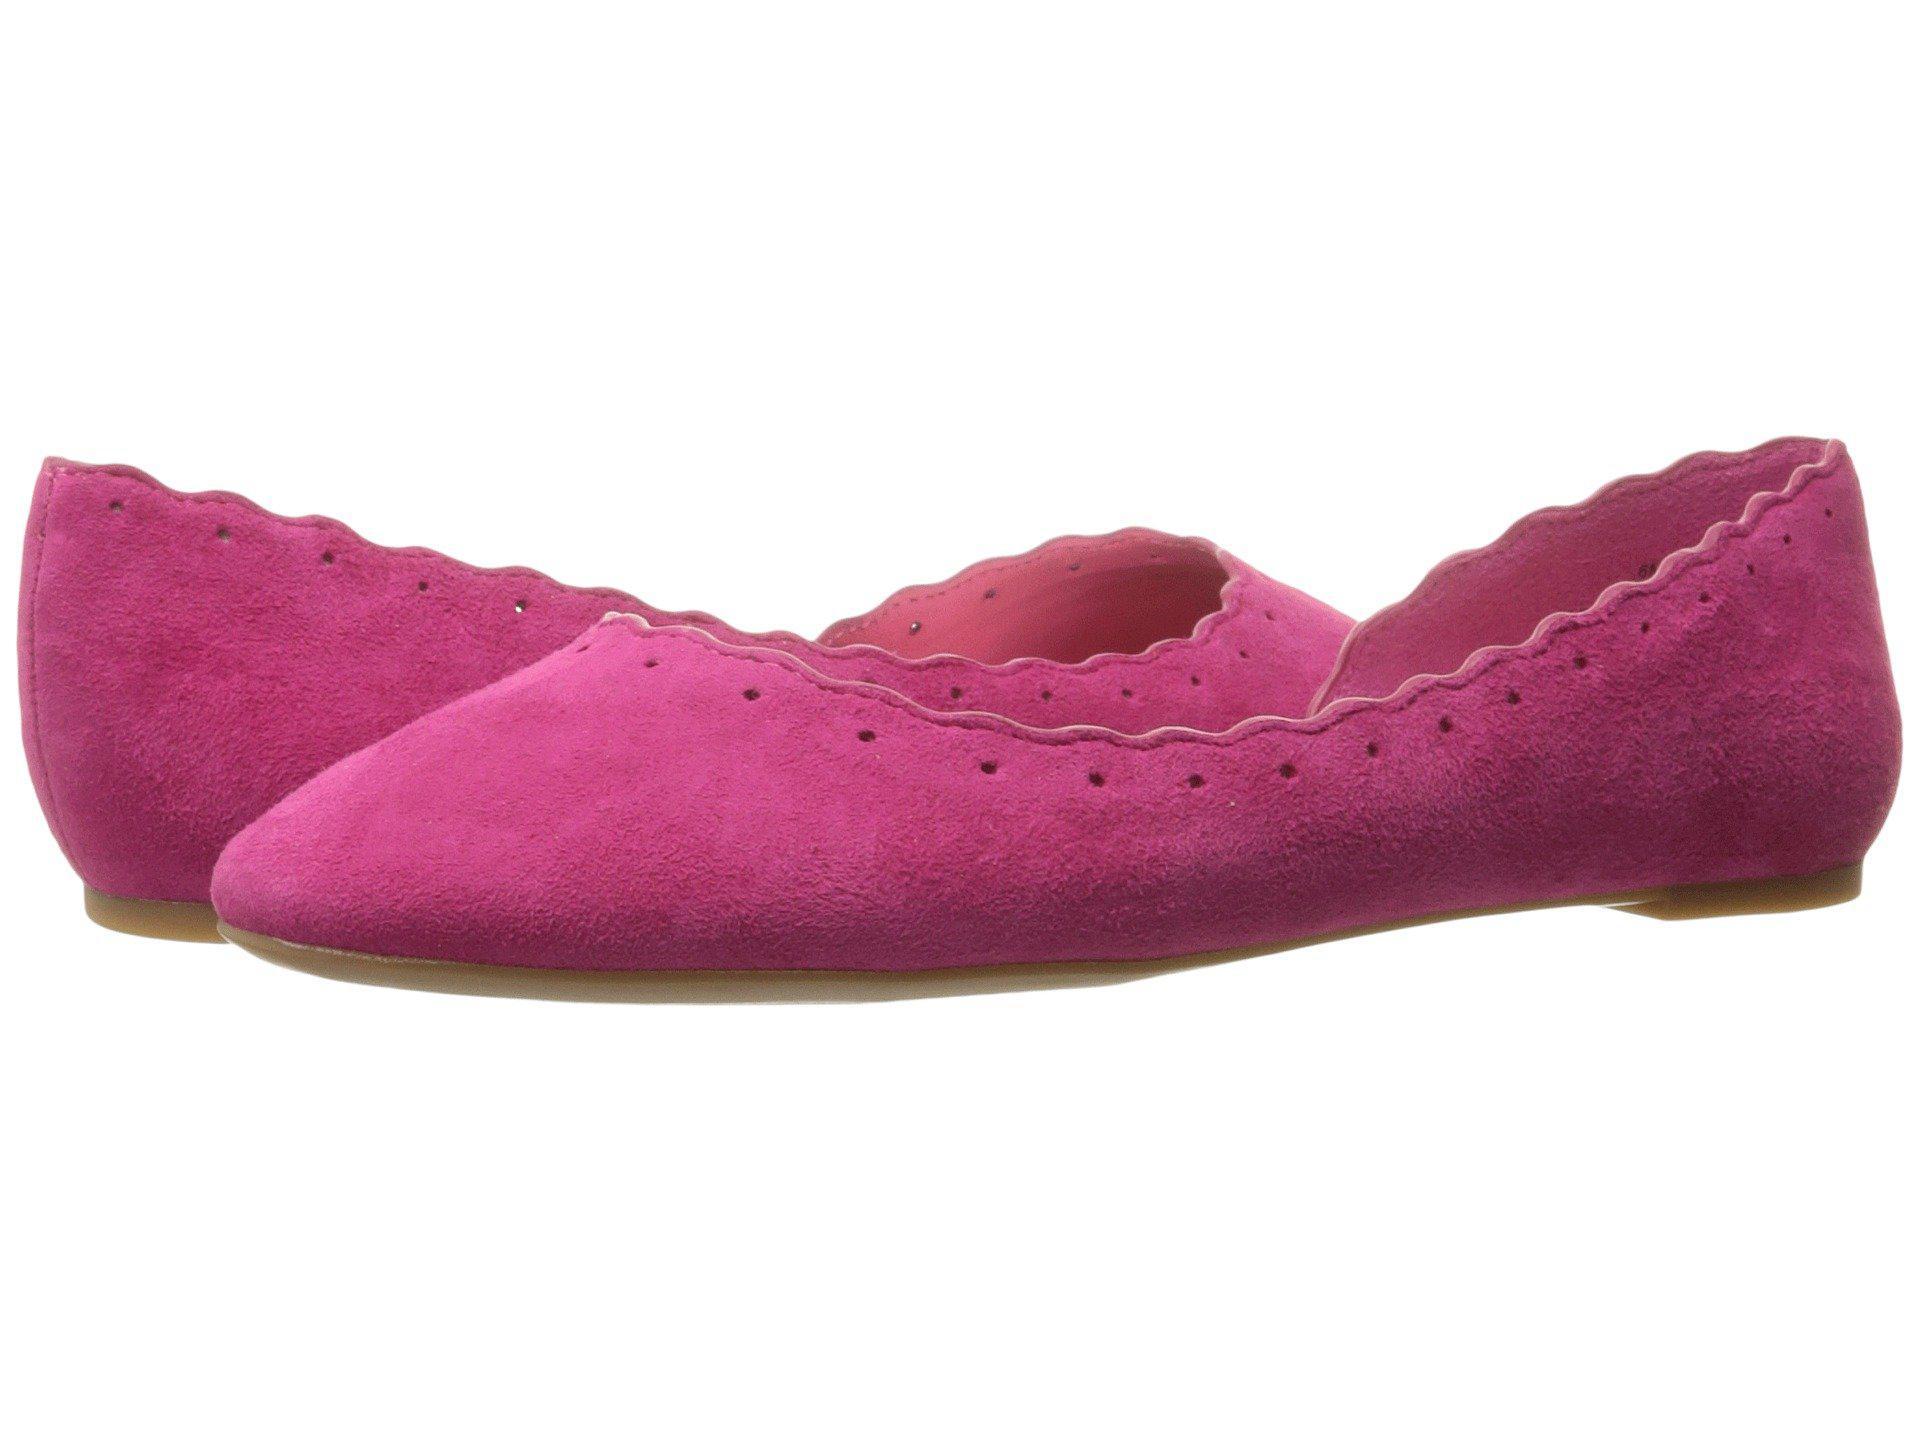 8092c01b7f01b Lyst - Nine West Mai Suede Ballet Flat in Pink